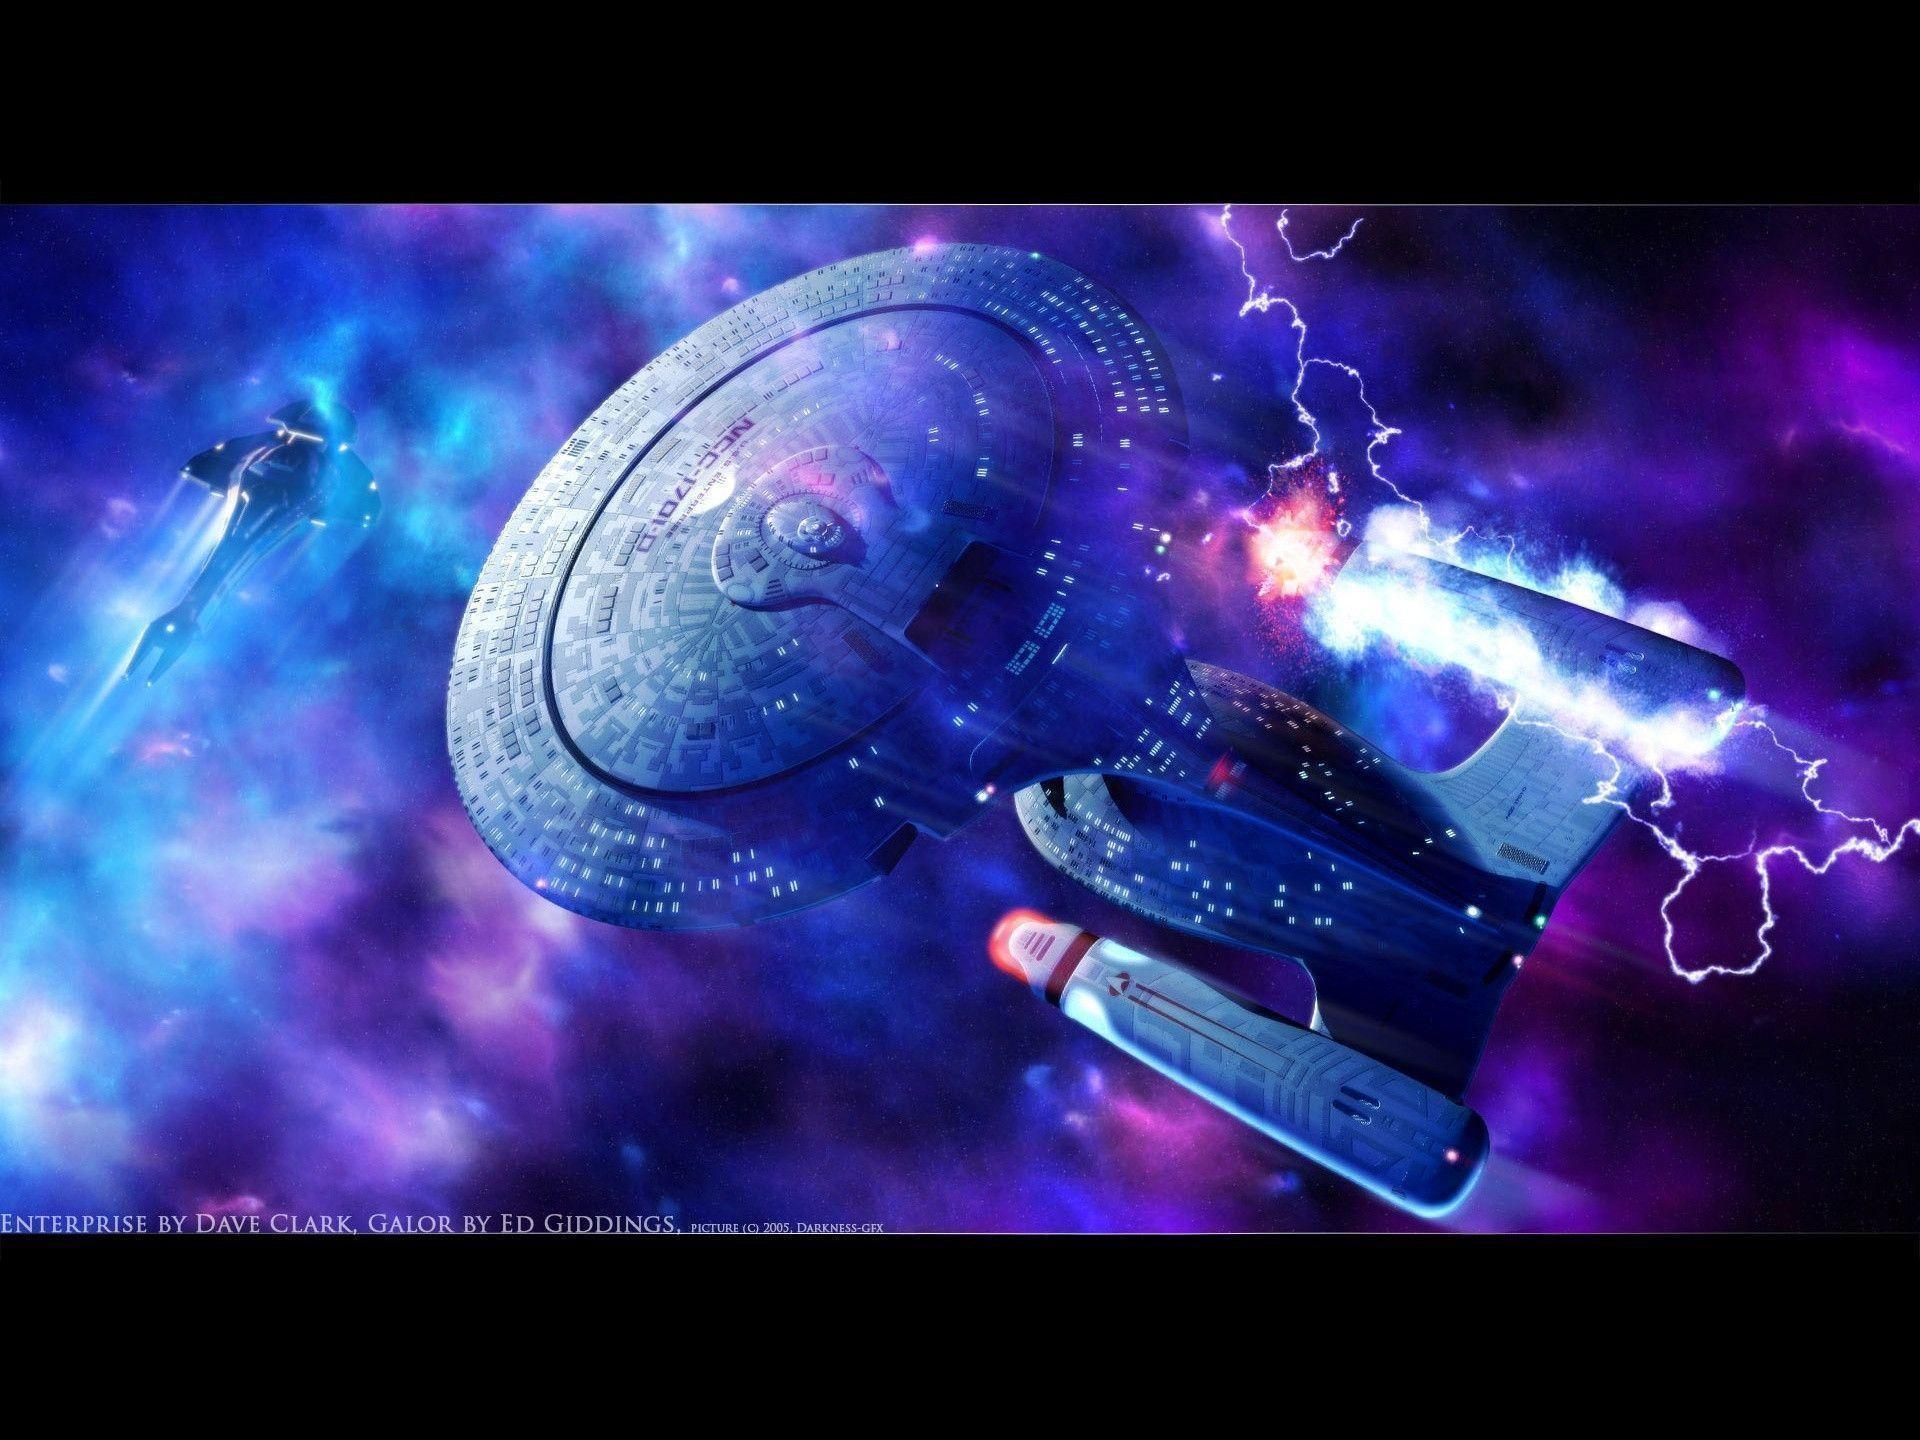 Star Trek Tng Wallpapers | HD Wallpapers Base